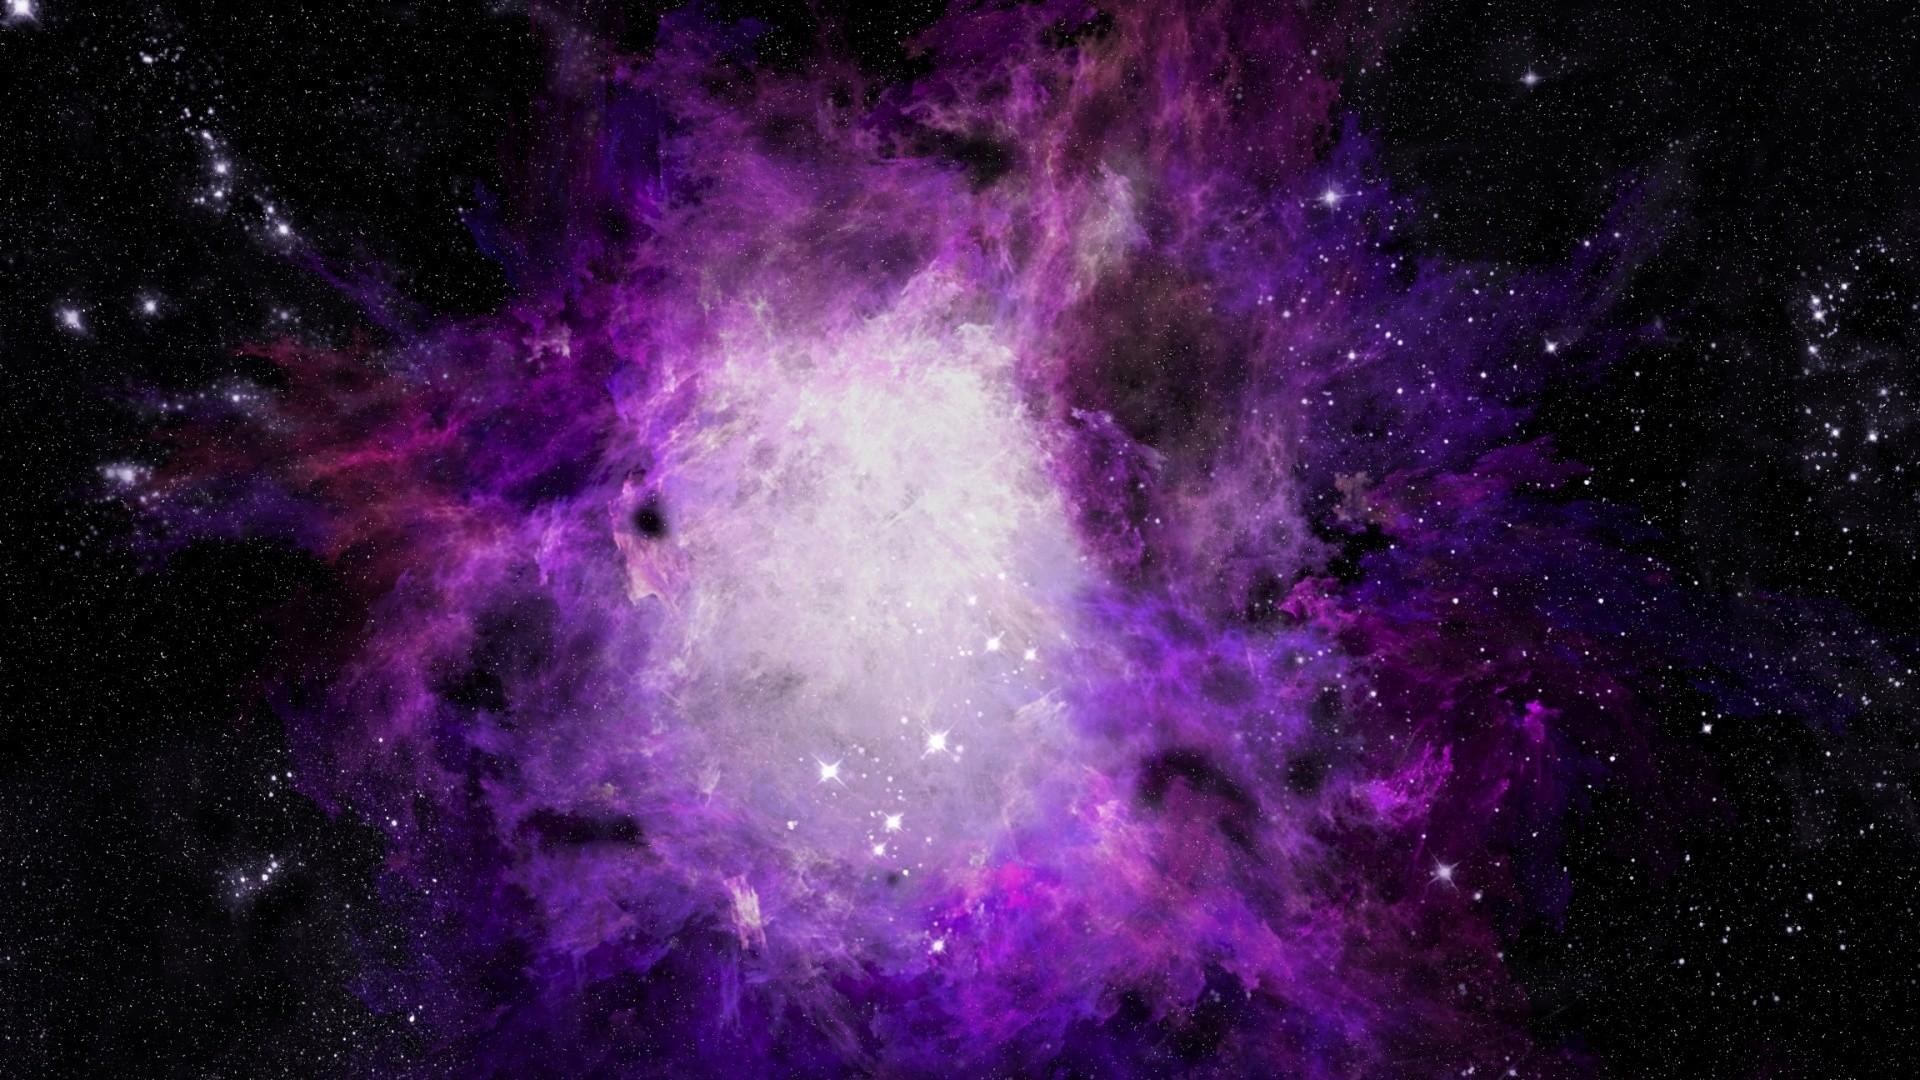 Purple Galaxy Picture For Desktop Wallpaper 1920 x 1080 px 623.08 KB purple  blue 1080p moon